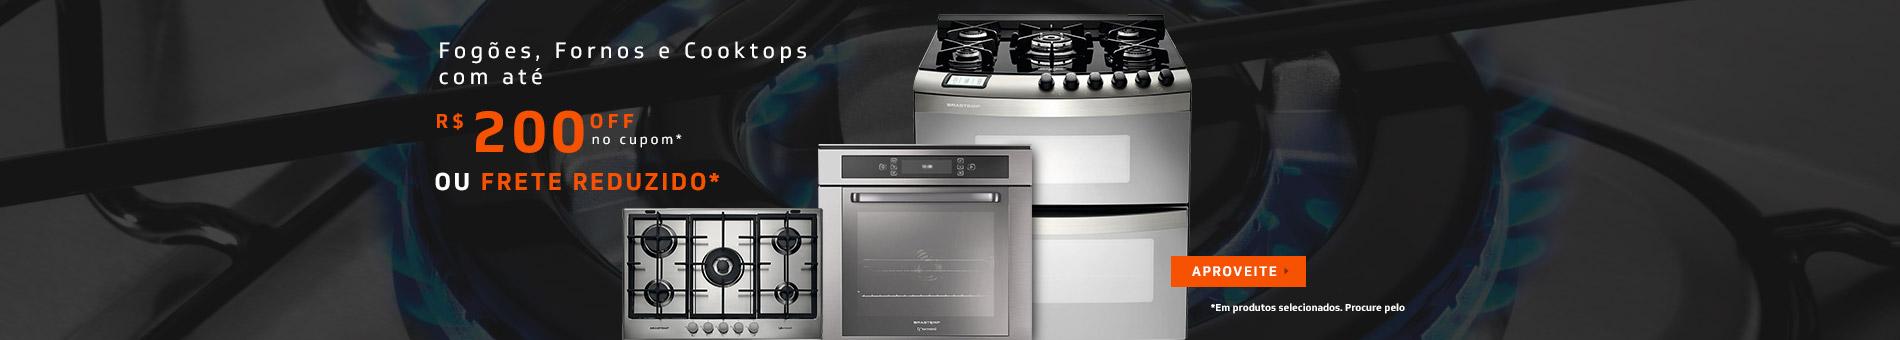 Promoção Interna - 2132 - camp-brastemp2_fogoes-forno-cooktops_19092017_home4 - fogoes-forno-cooktops - 4